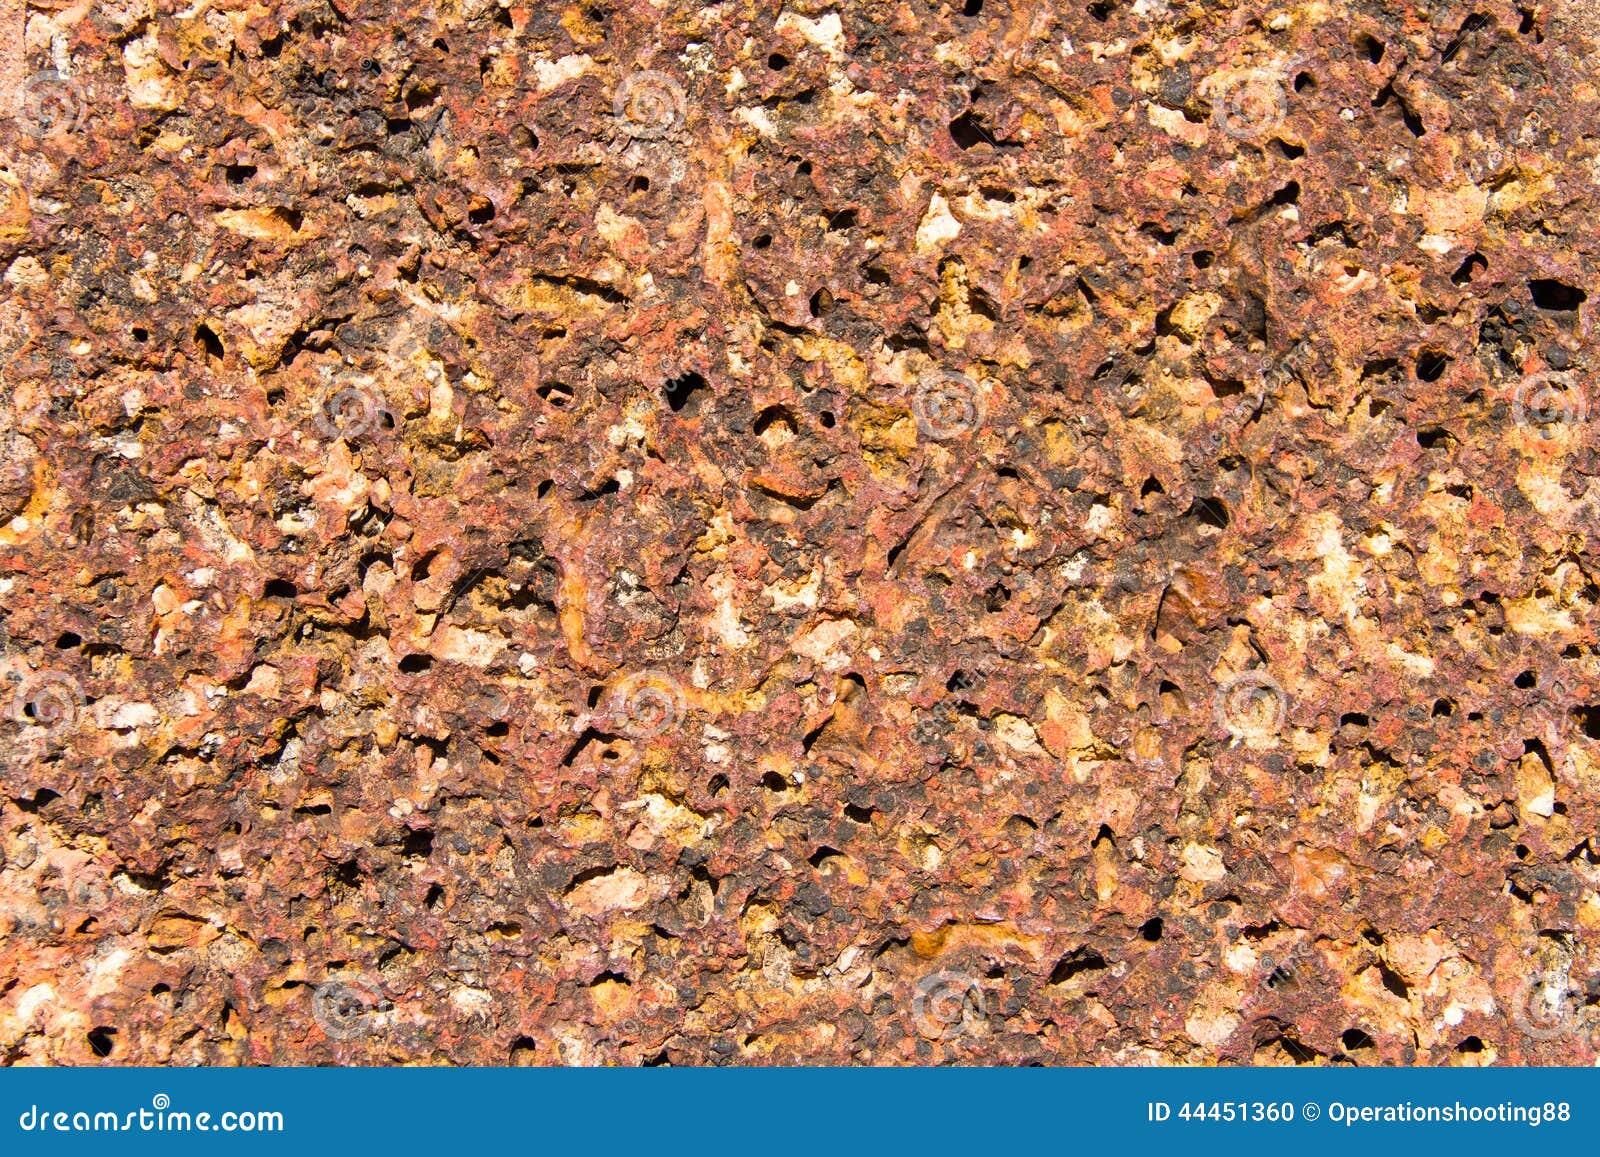 Business plan for brick soil production